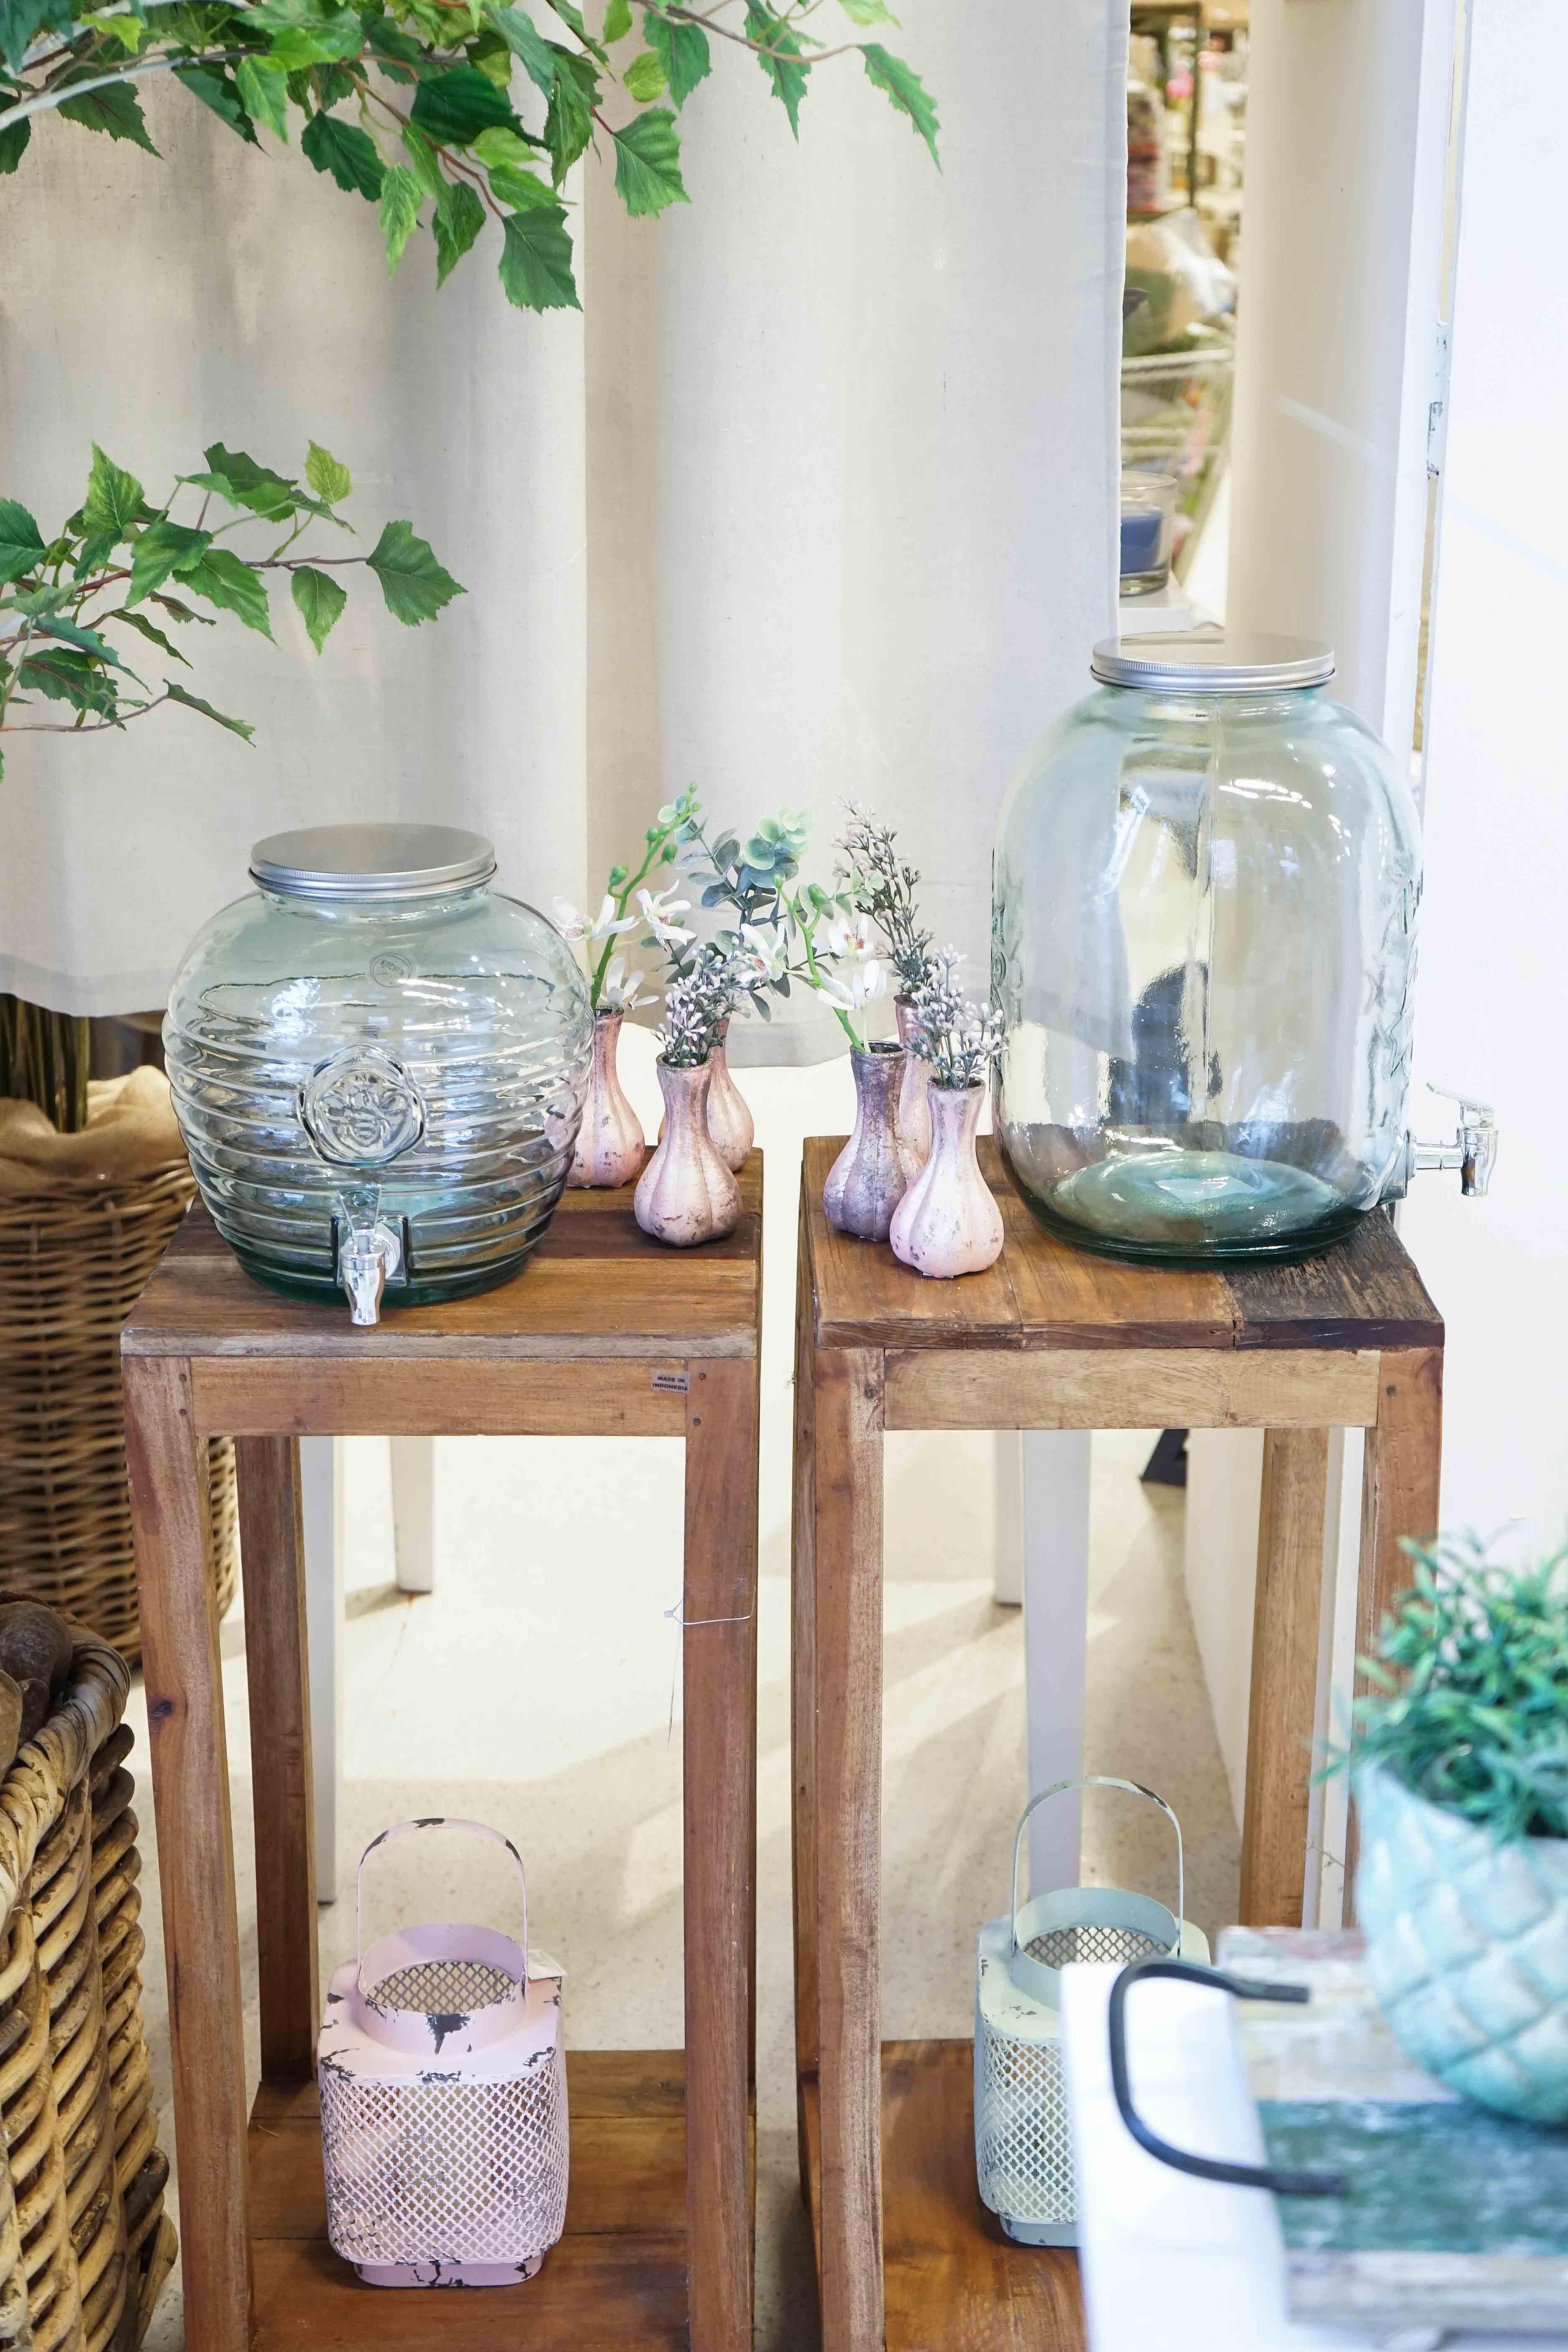 018 Willenborg Deko Fruehling Ostern Boho Vase Bowle Glas